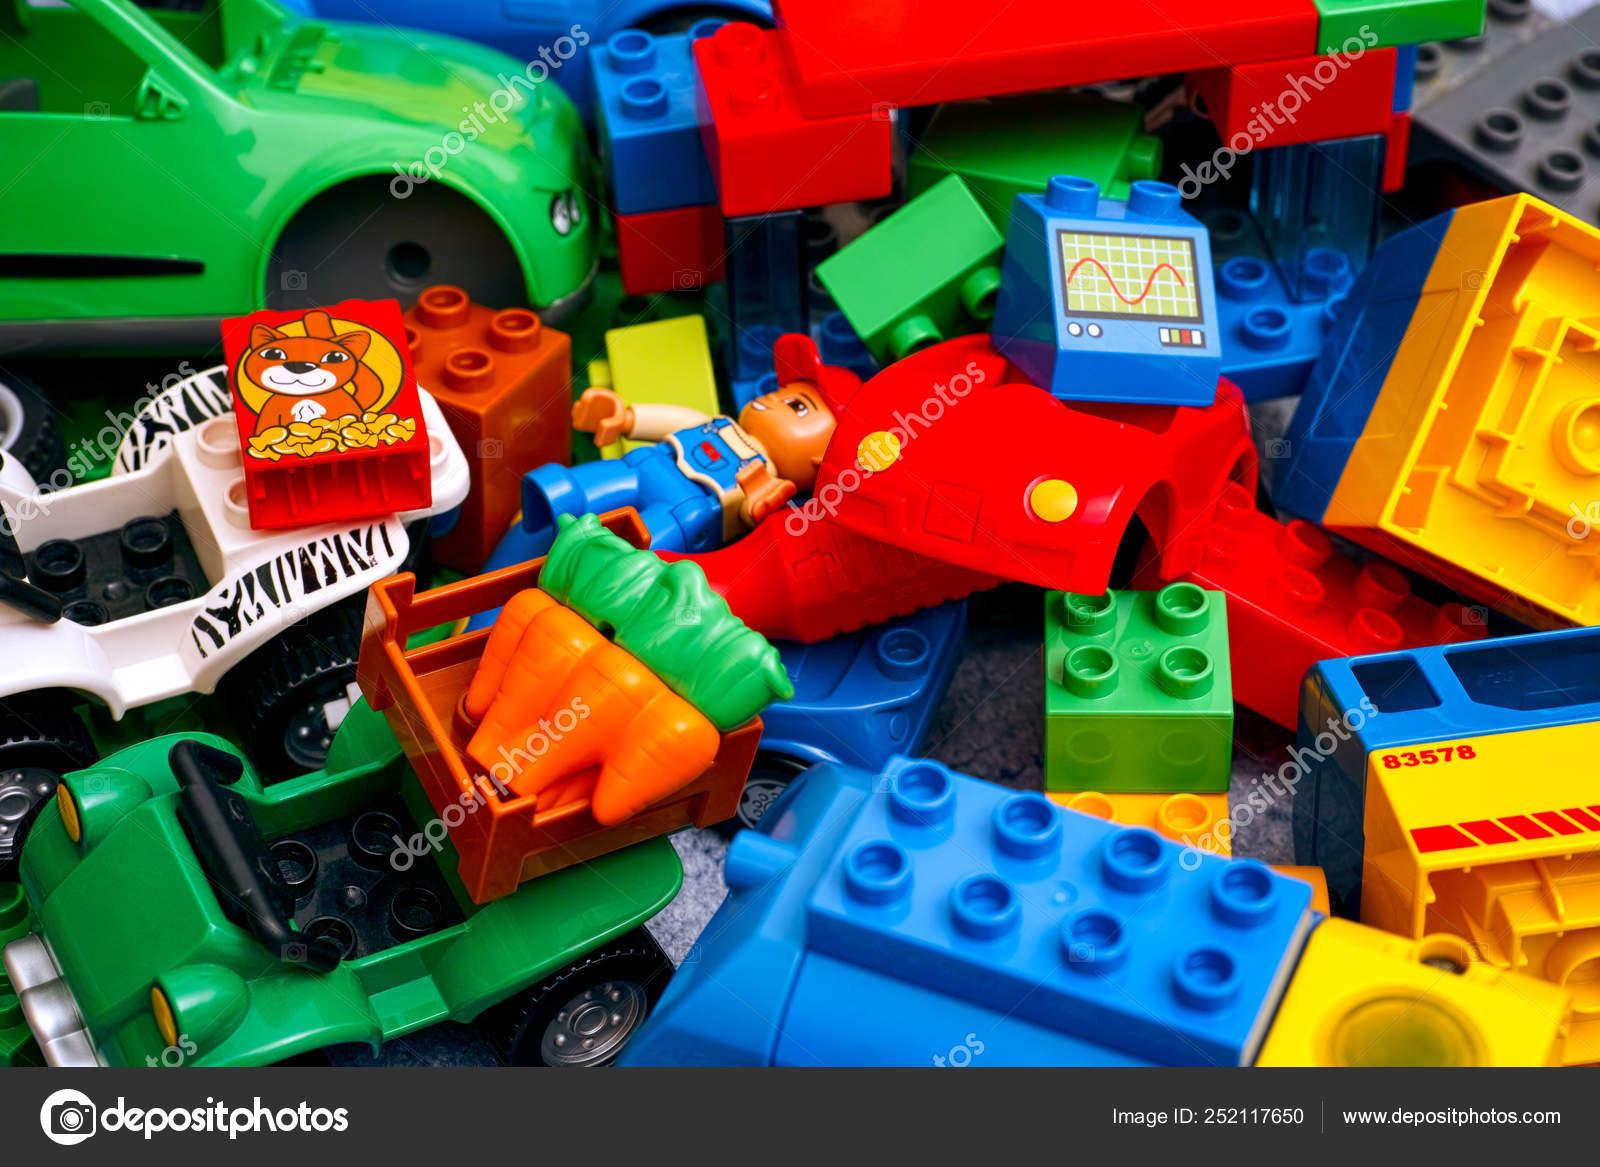 Foto DuploCoches De Juguetes— Lego Bloques Montón Y Editorial nyv0wON8m